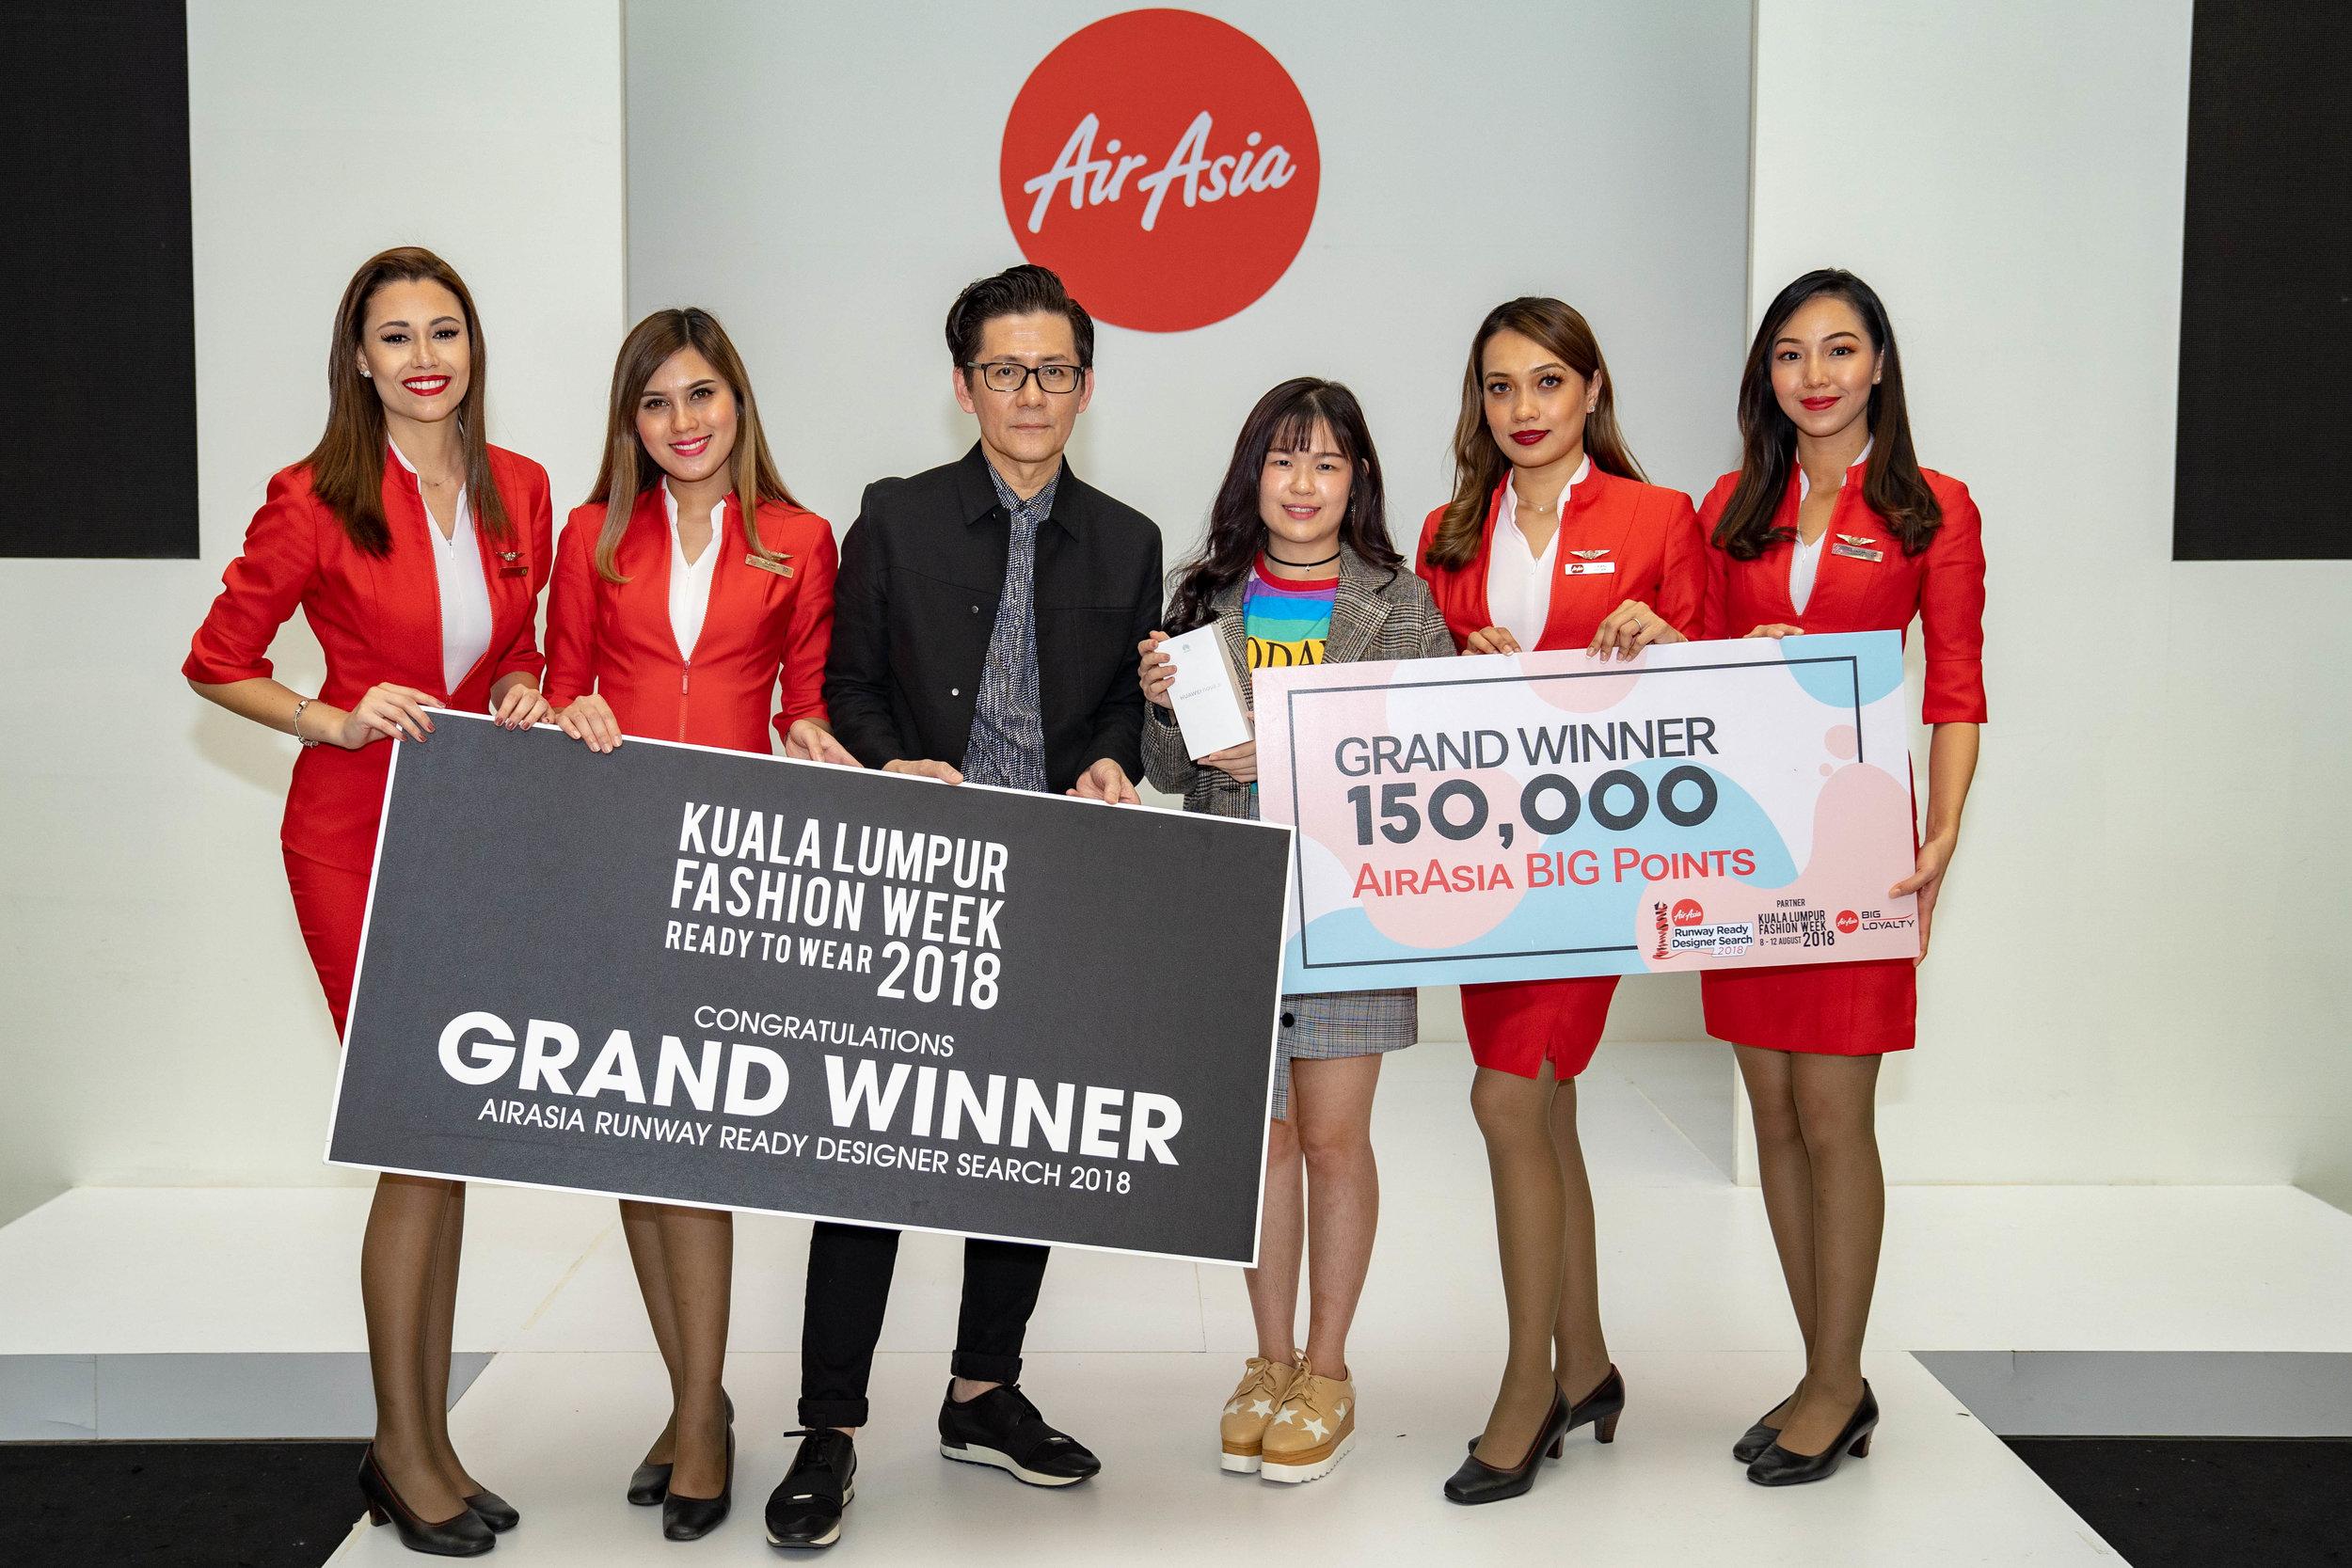 Keterangan Gambar: (Tengah) Pengasas KL Fashion Week Andrew Tan bersama Pemenang Utama AirAsia Runway Ready Designer Search 2018 Daphne Lim Wen Sin dari Fashion Academy.